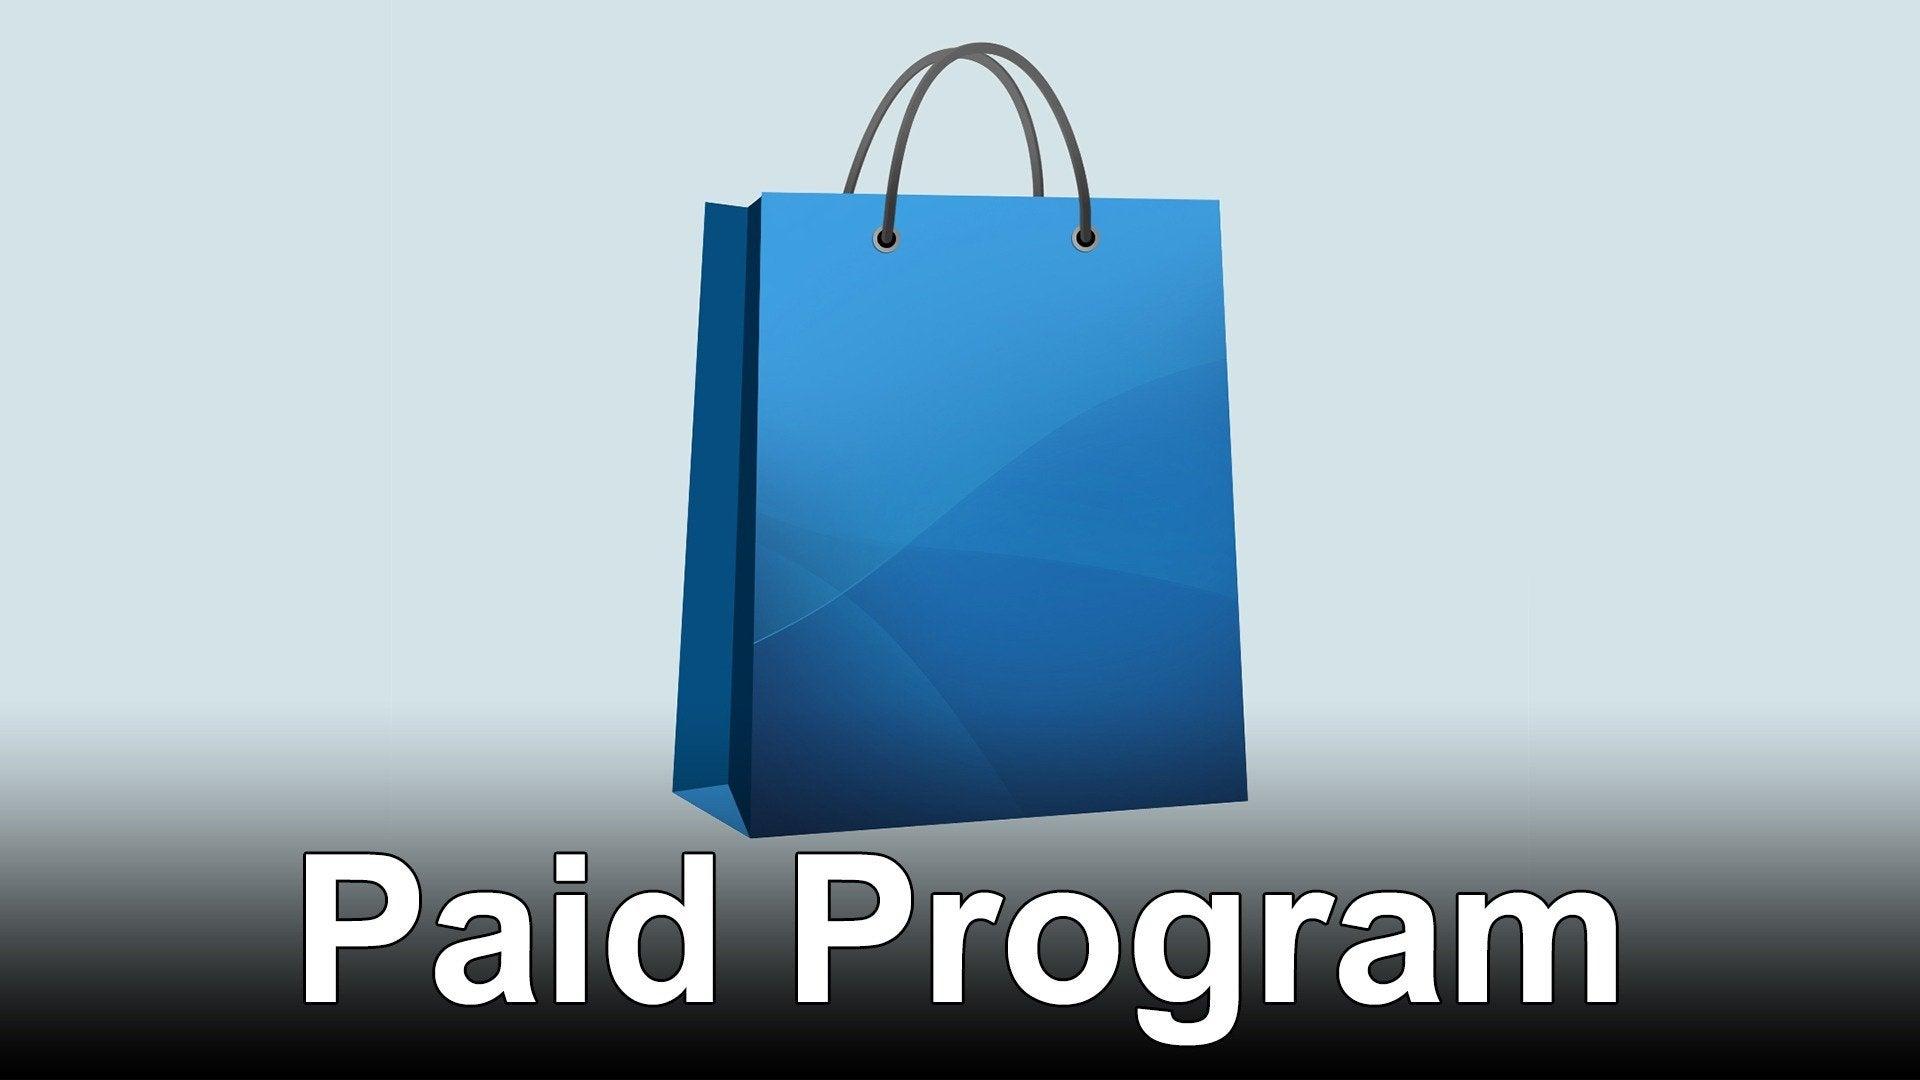 Paid Program